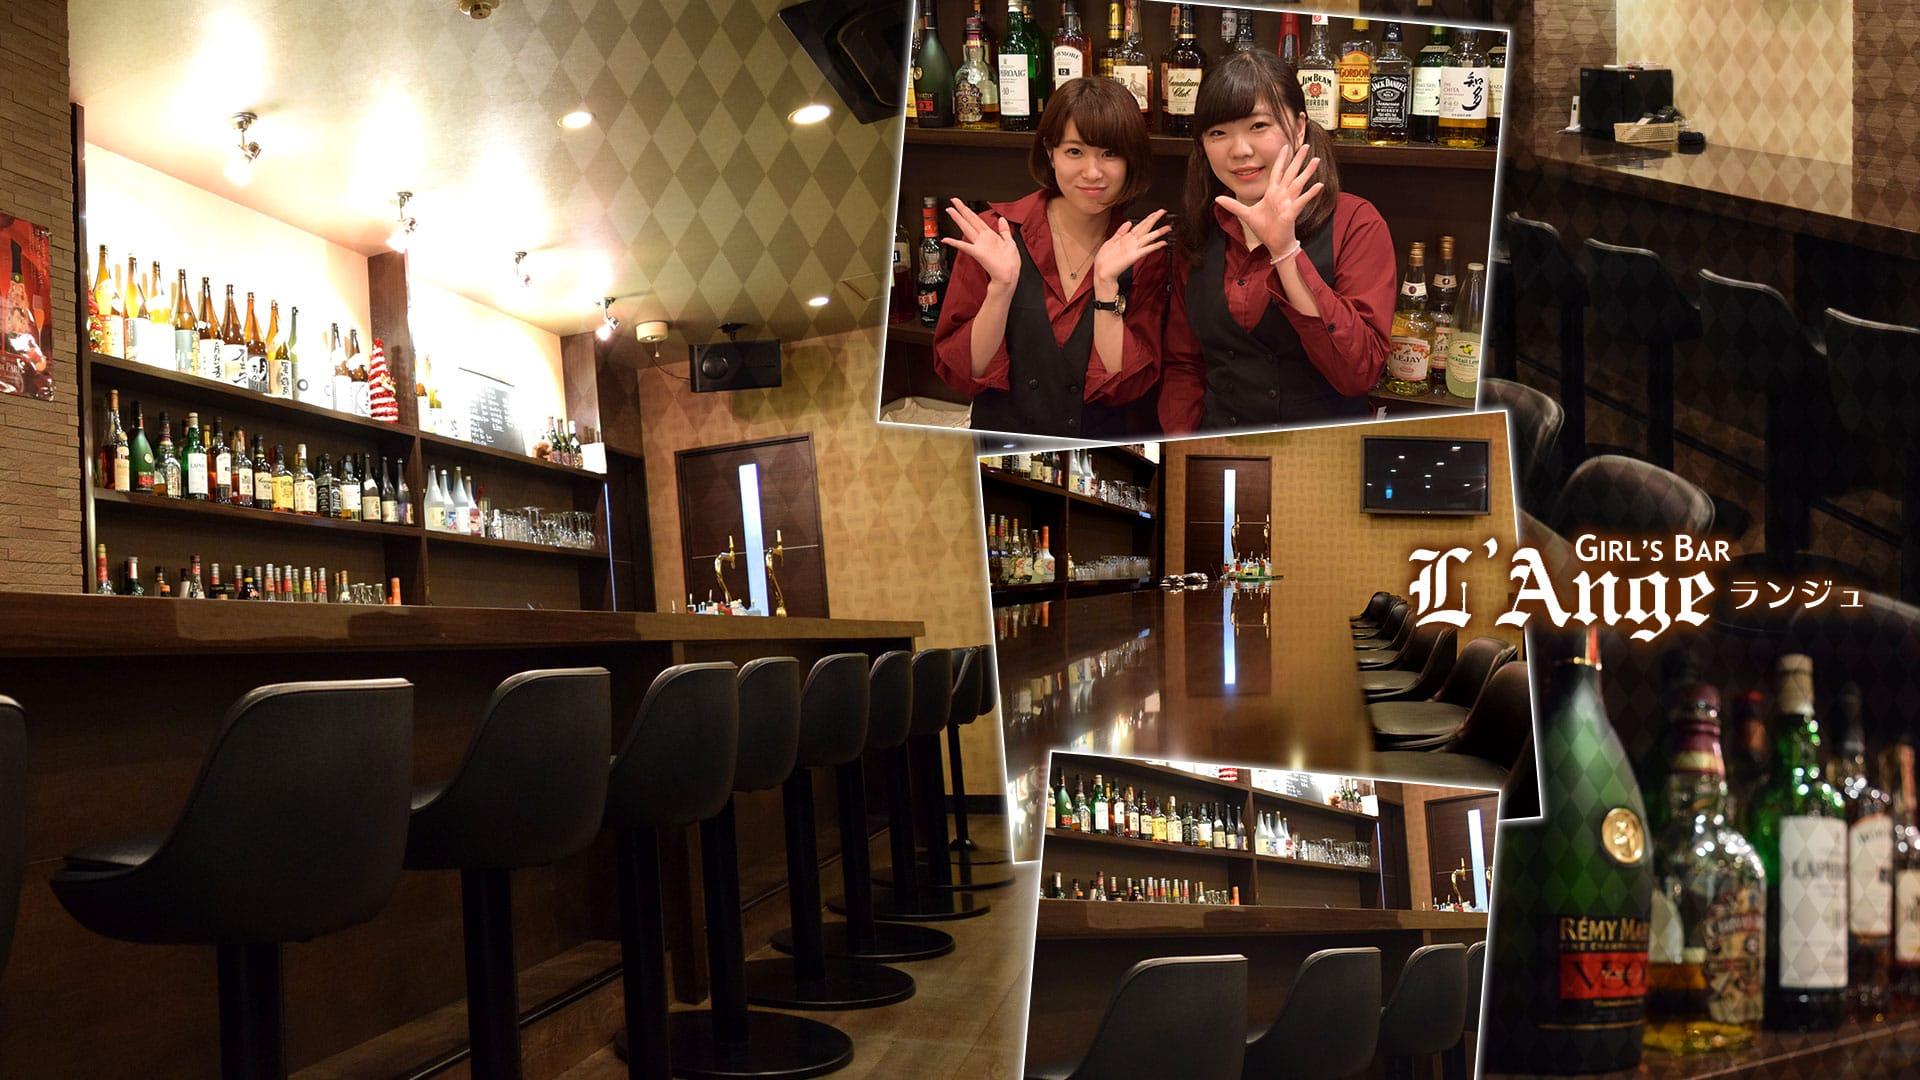 GIRL'S BAR L'Ange~ランジュ~【公式】 蒲田ガールズバー TOP画像